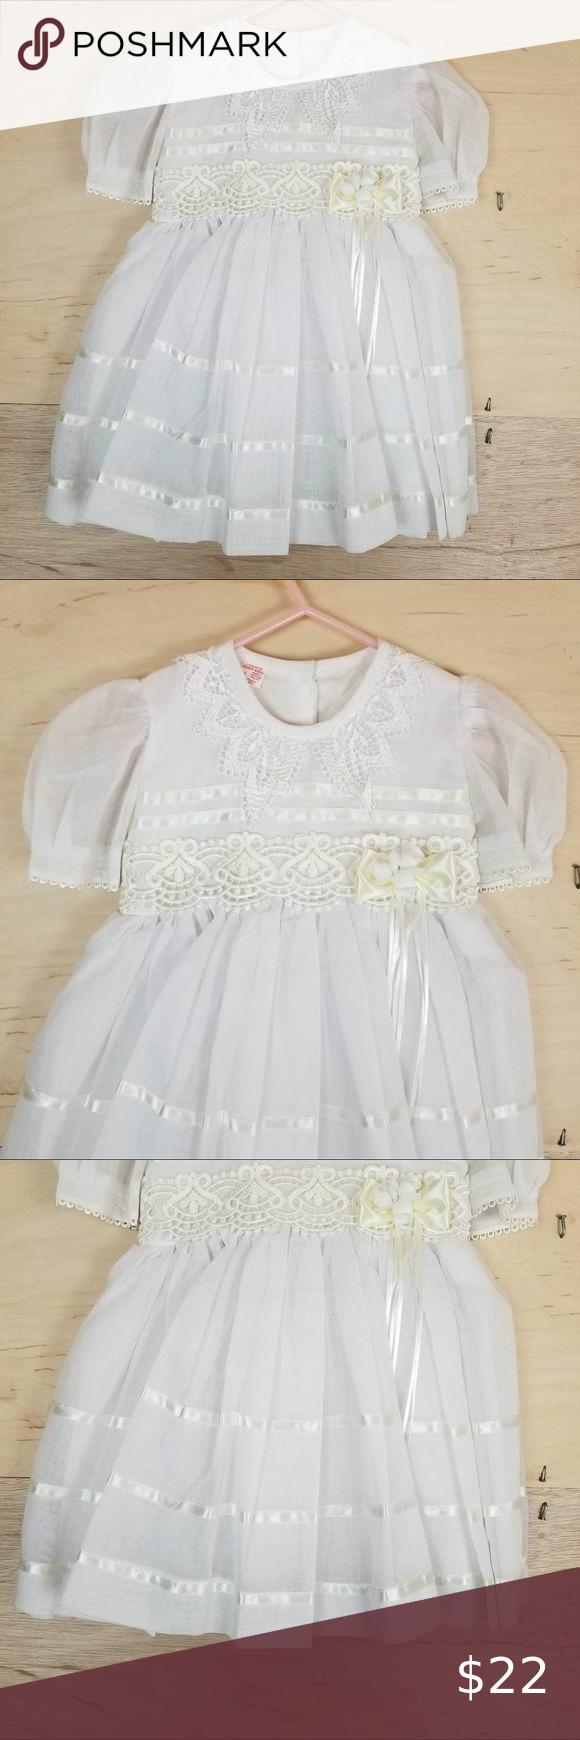 Vintage Enny Kids Sheer White Lace Dress Lace White Dress Lace Dress Lace Dress Vintage [ 1740 x 580 Pixel ]